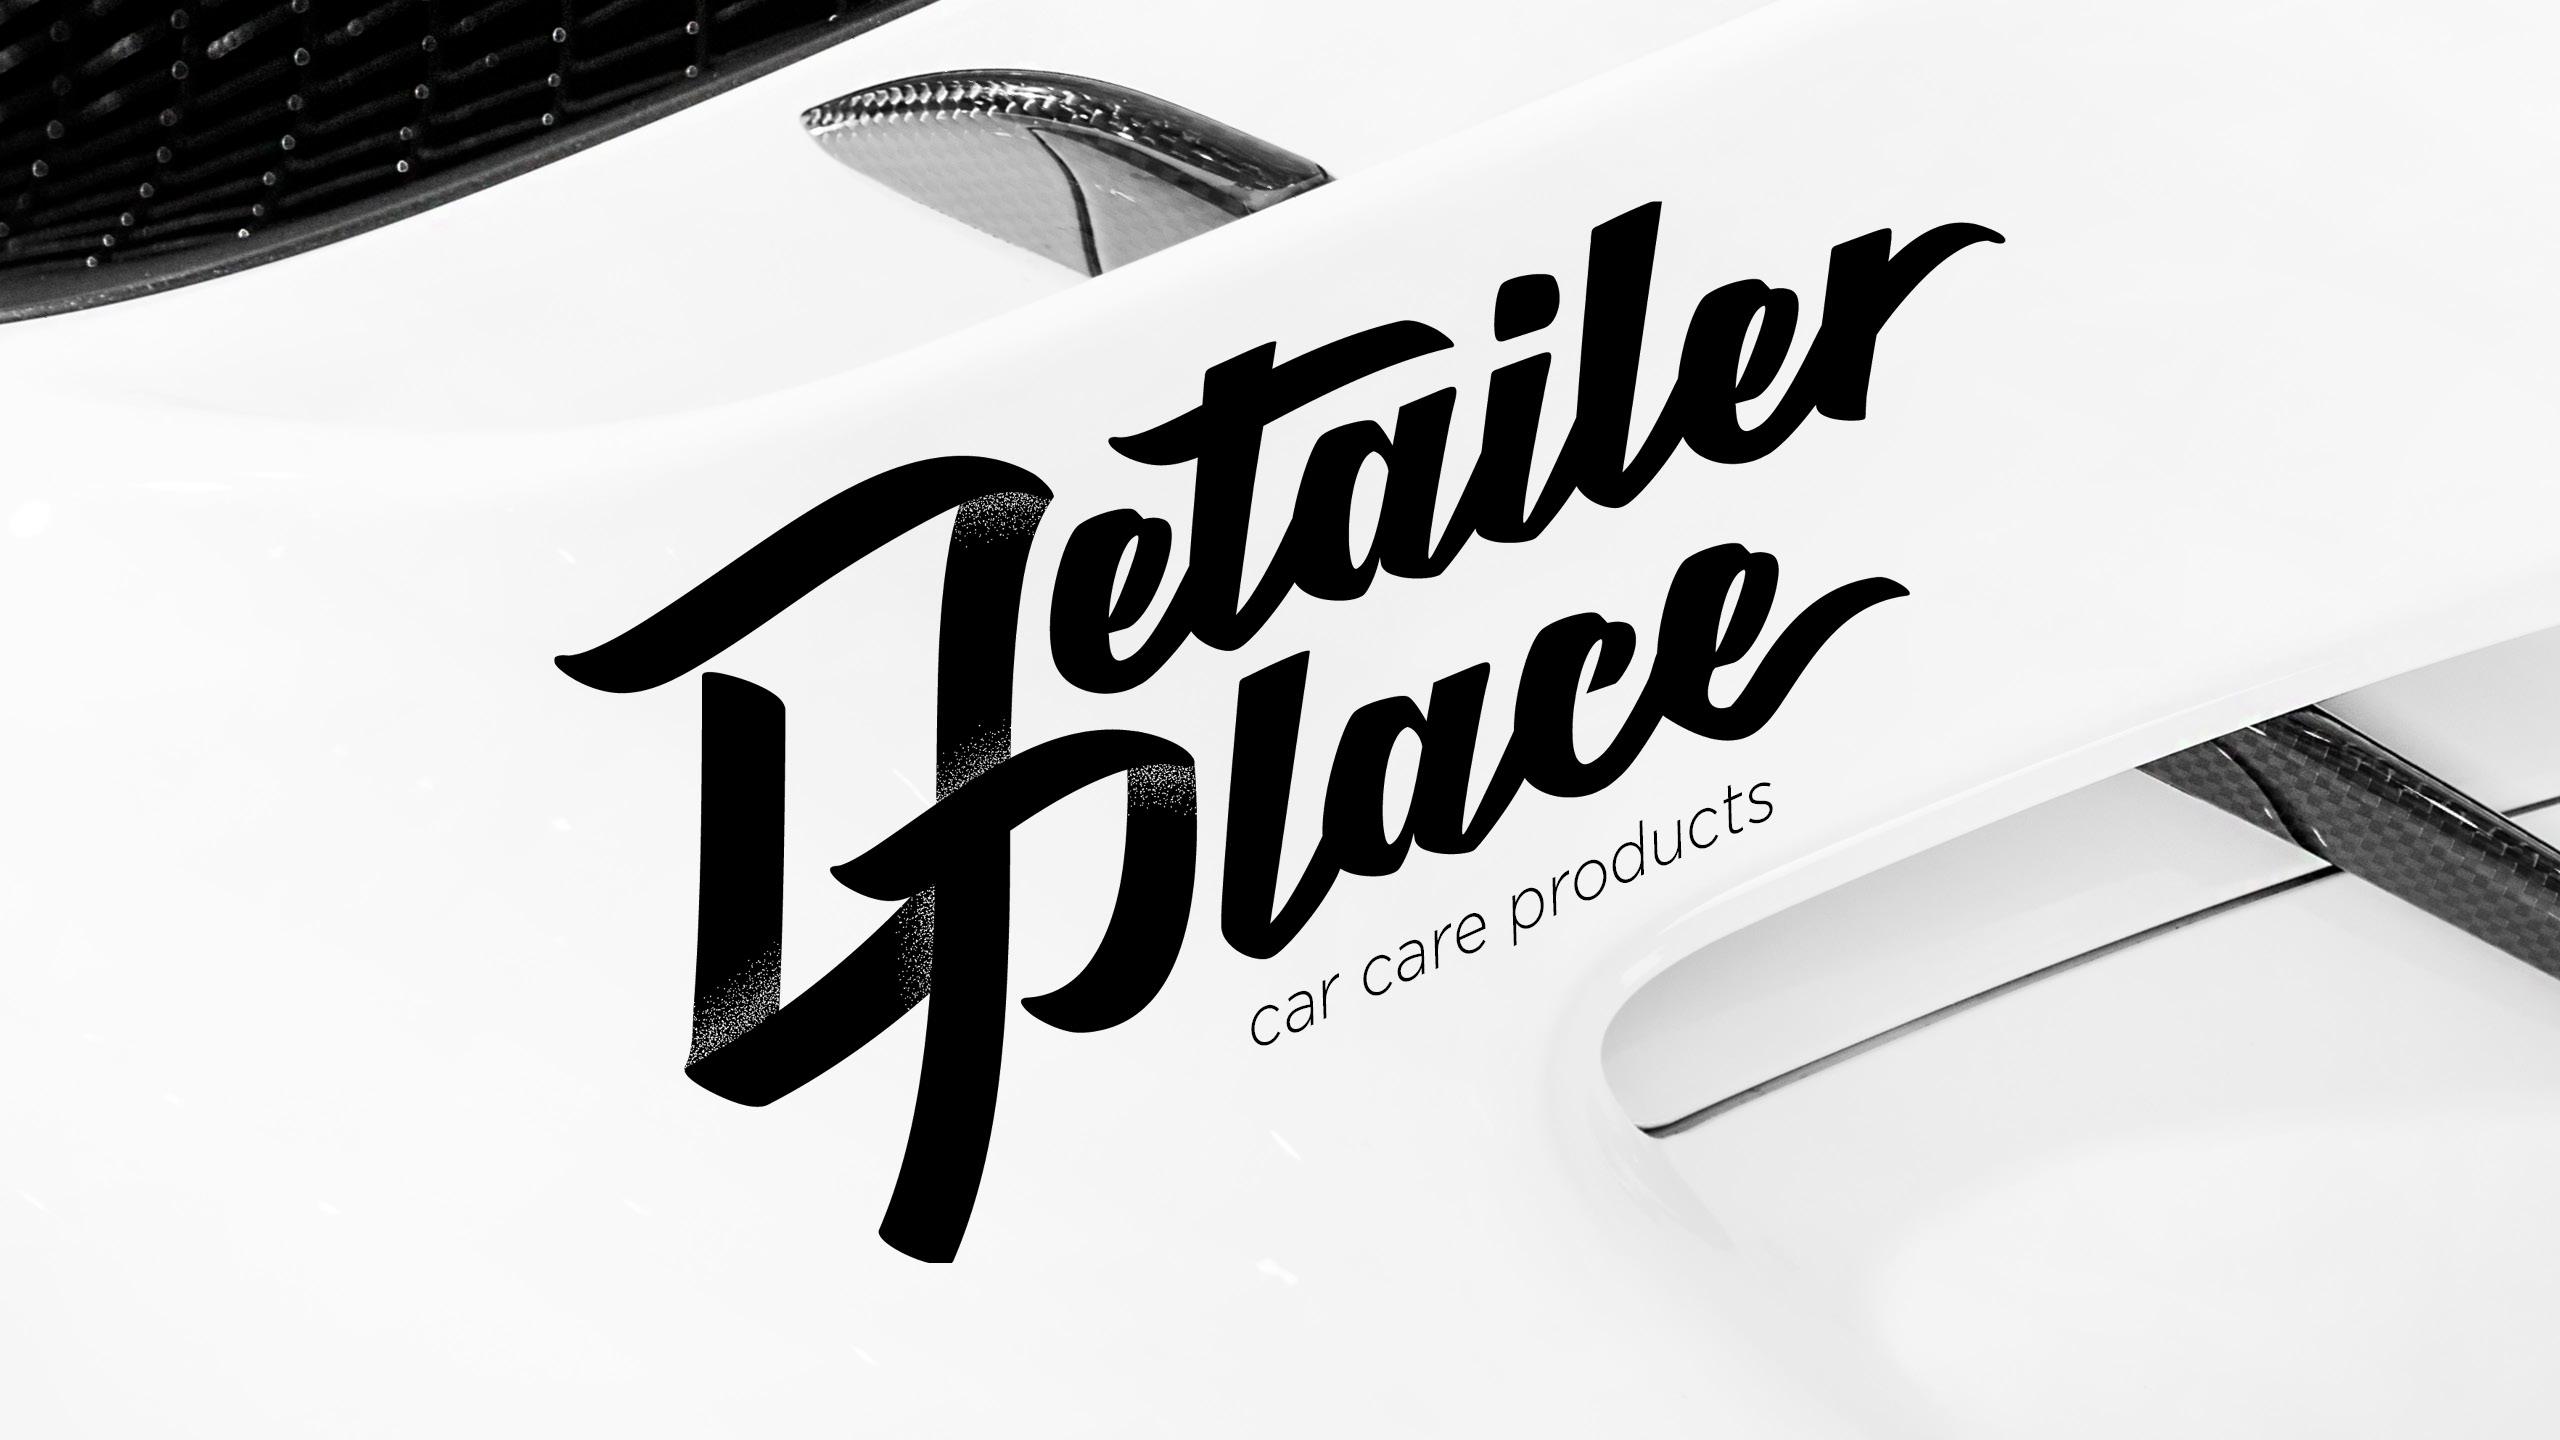 Detailer Place logobou design 05